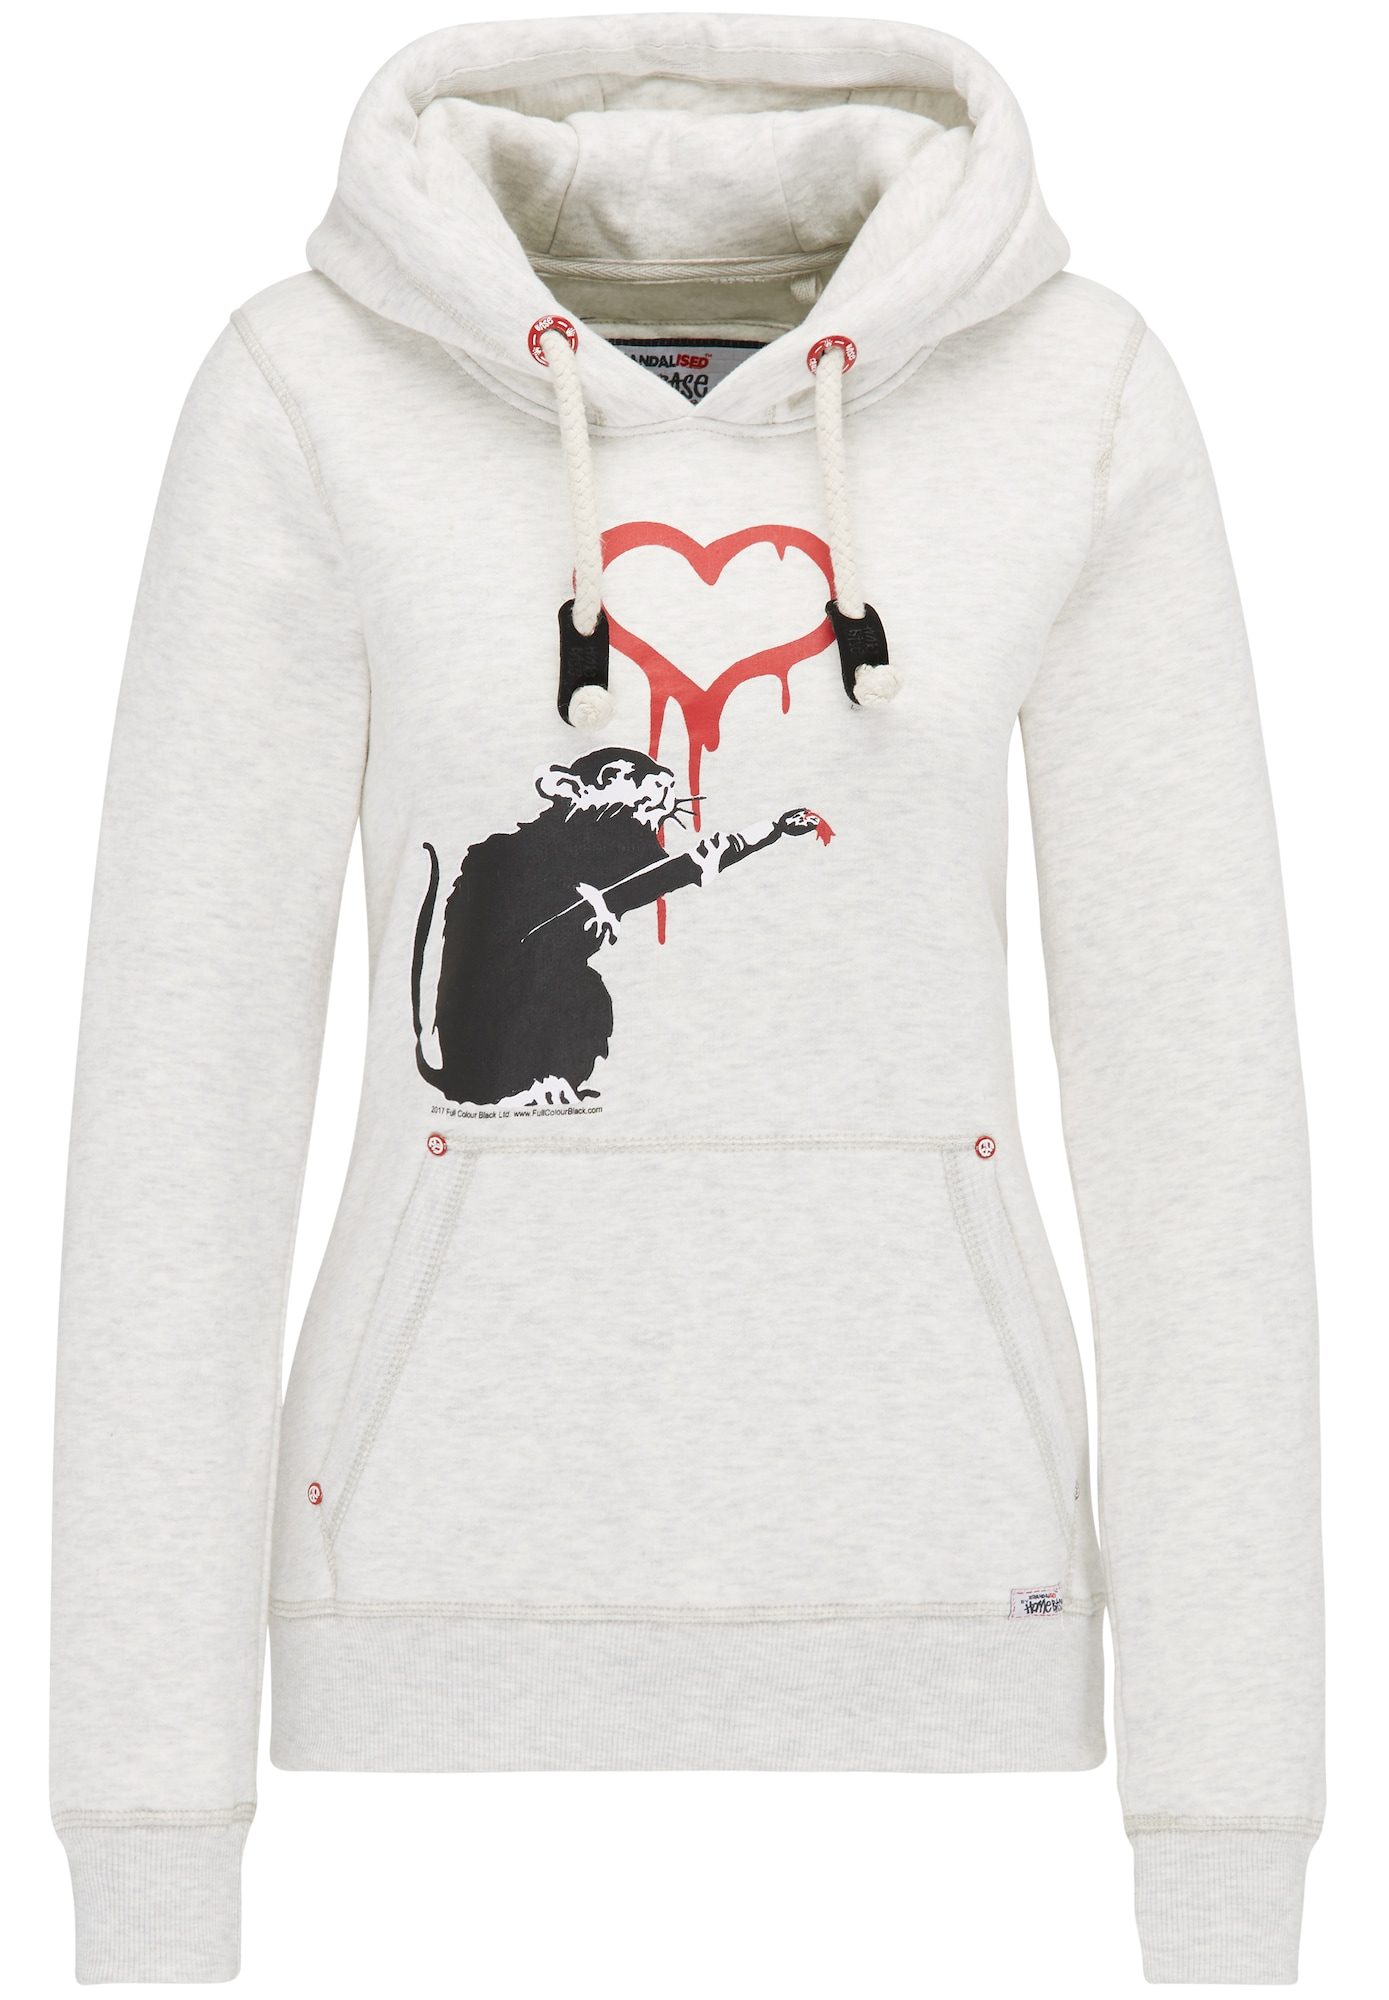 HOMEBASE, Dames Sweatshirt, wolwit